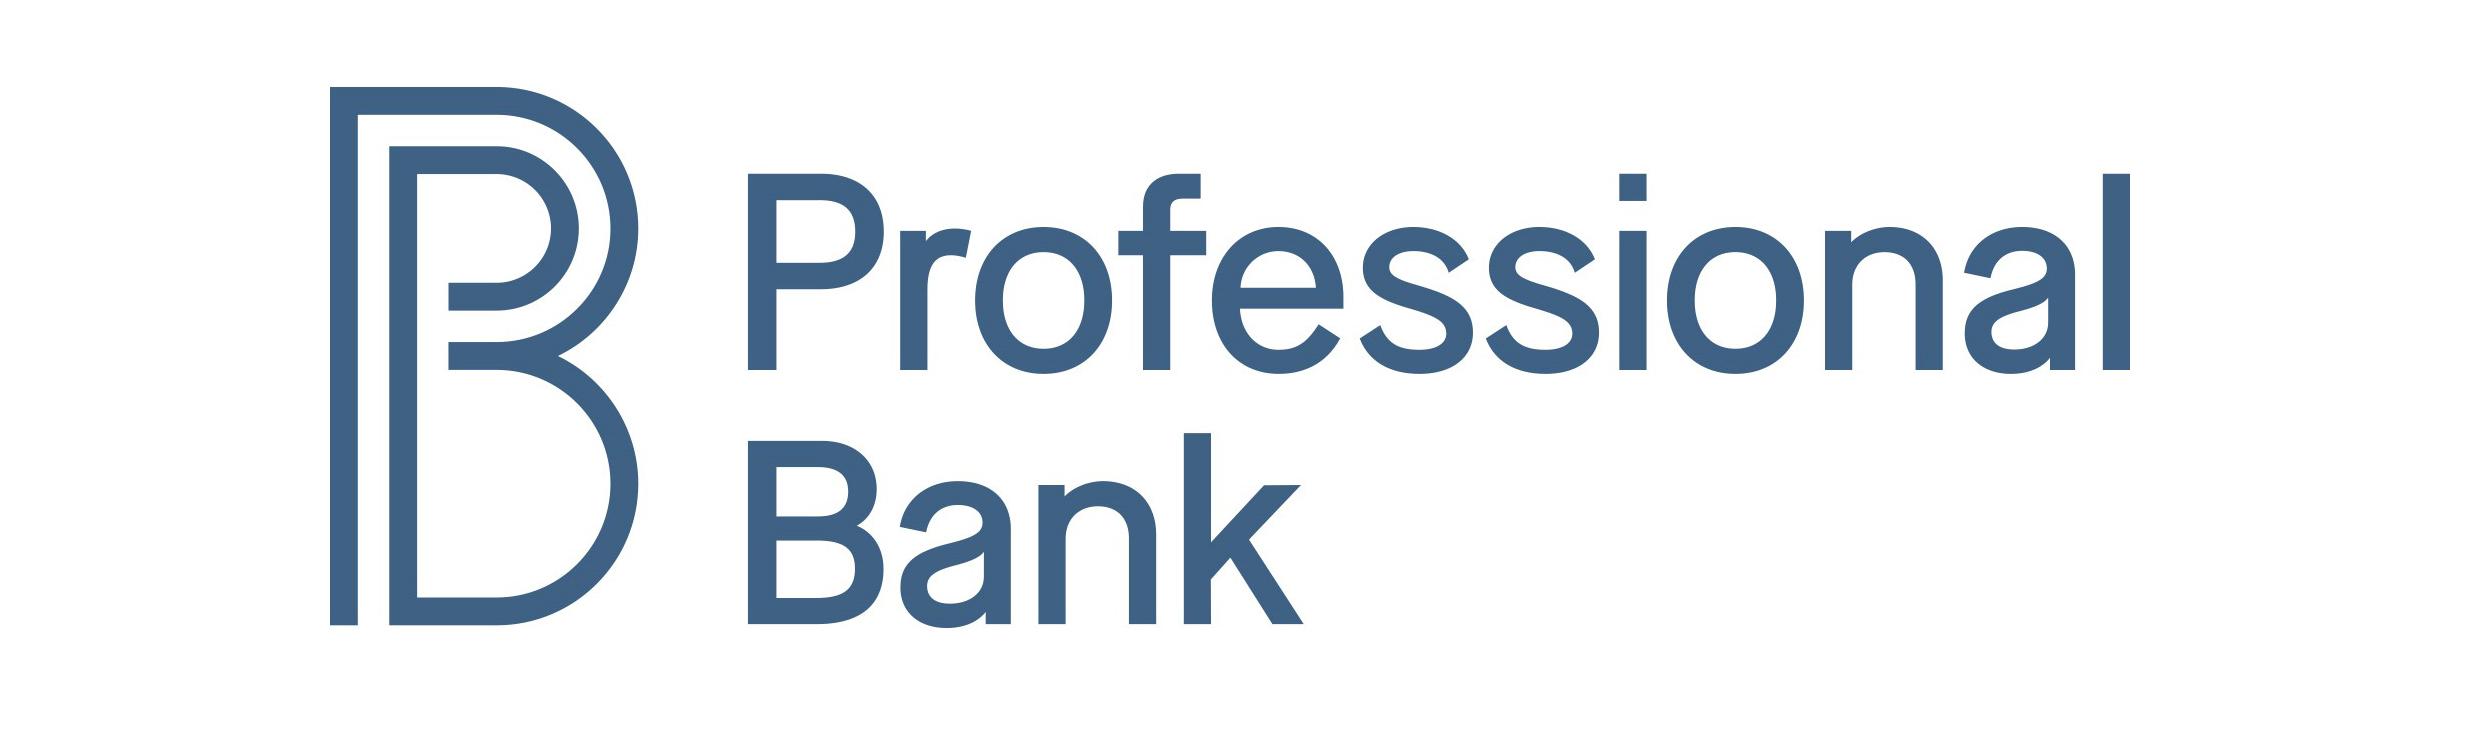 ProfessionalBank.jpg